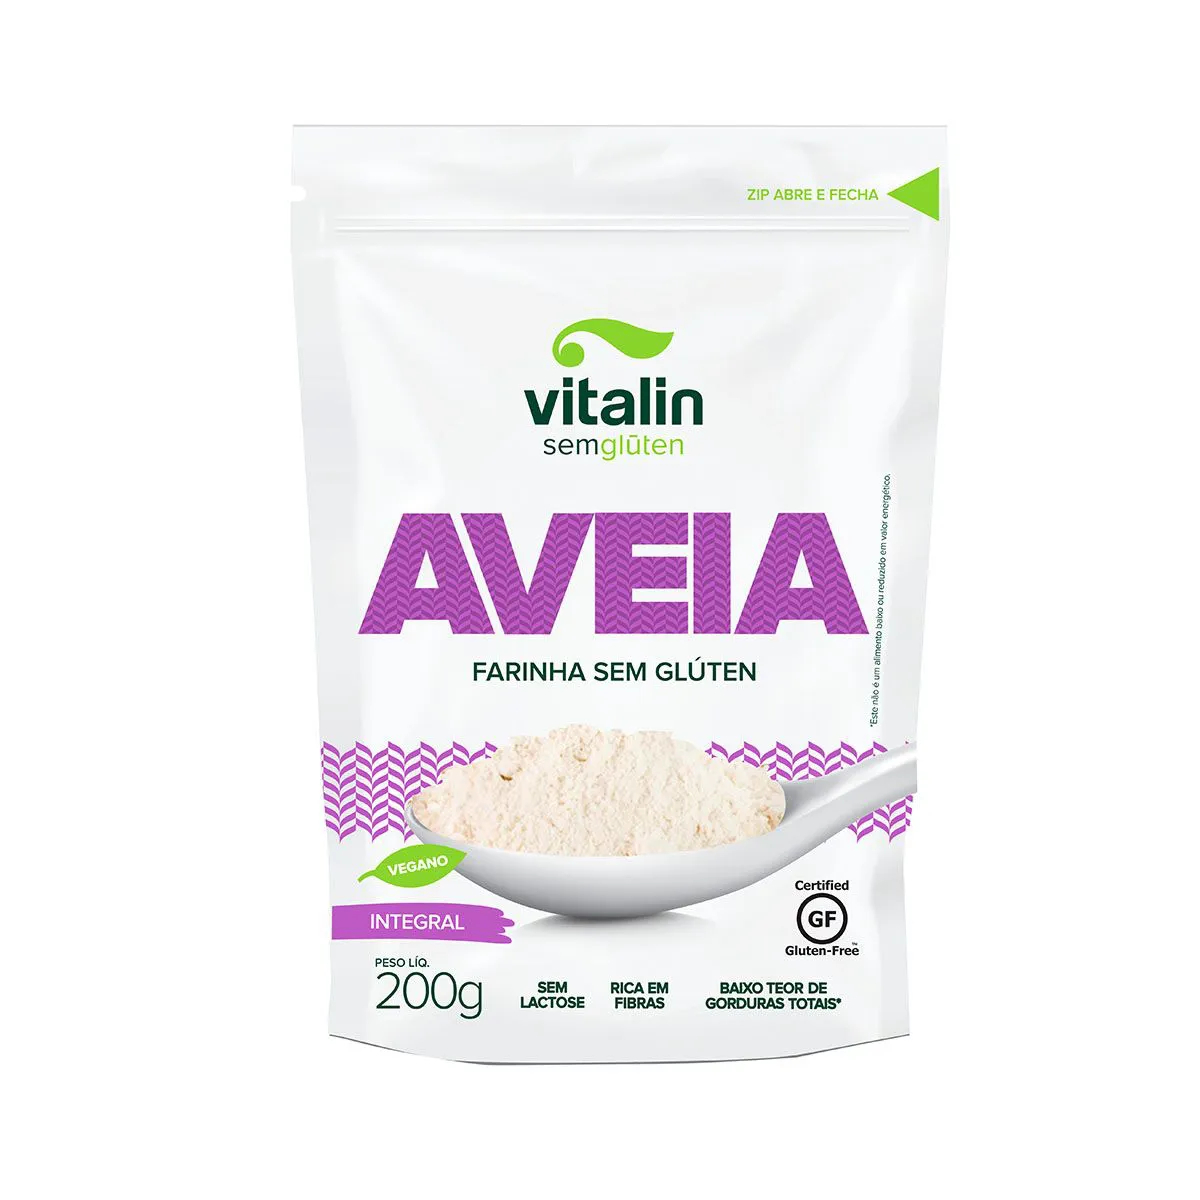 Farinha de Aveia Sem Glúten 200g - Vitalin